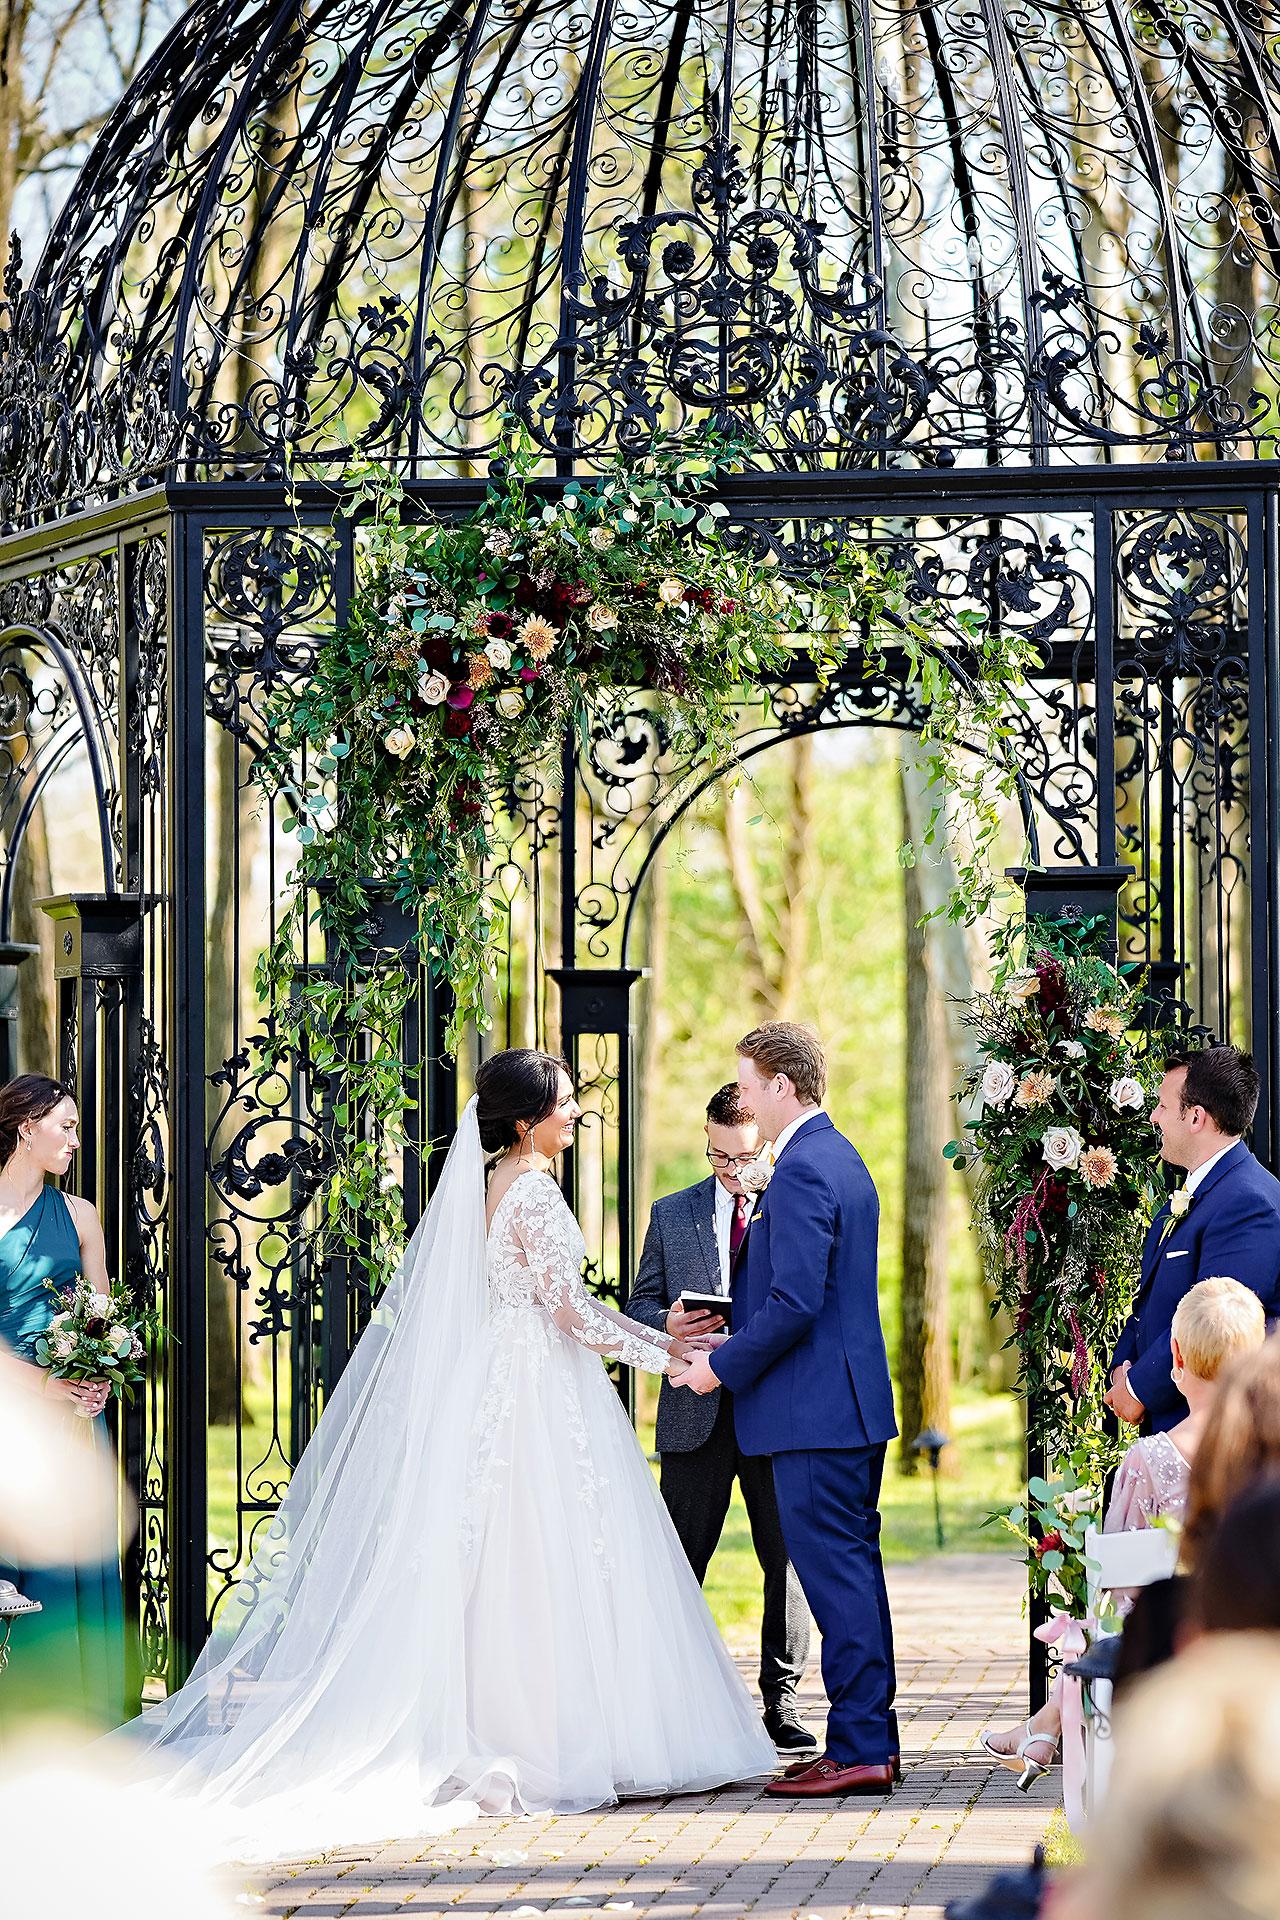 Nadia Parker Black Iris Estate Carmel Indiana Wedding May 2021 175